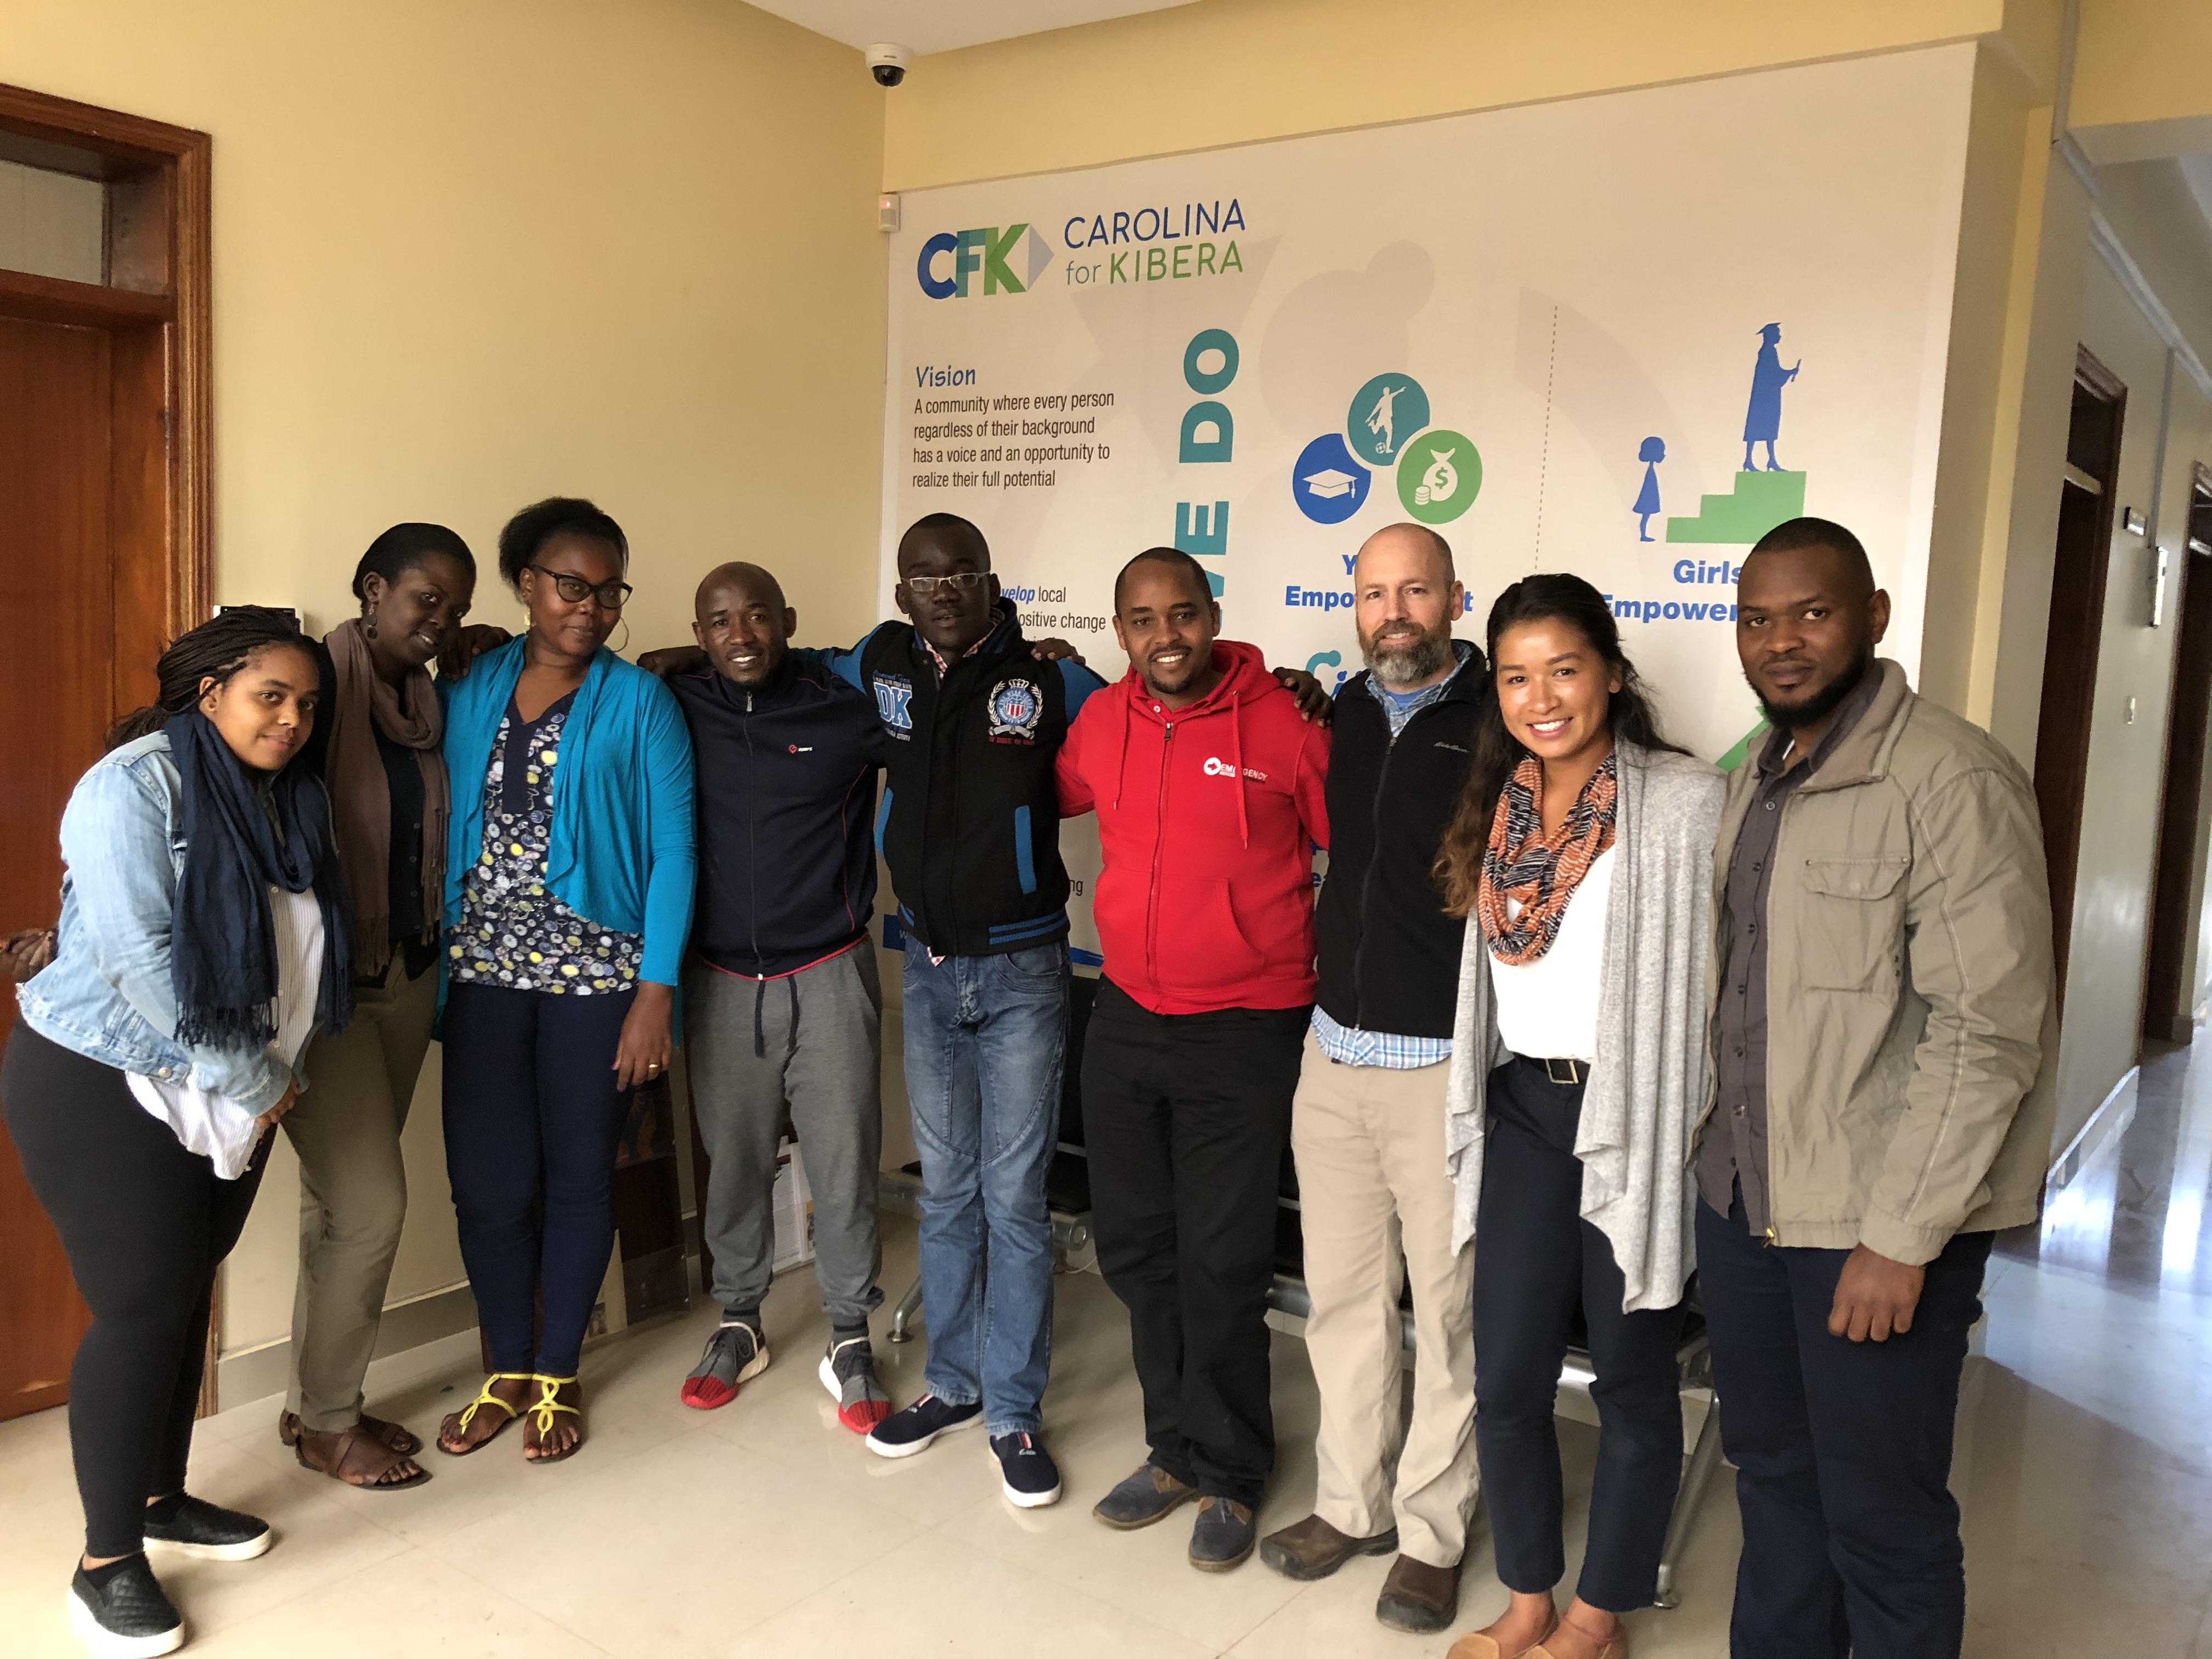 Carolina_for_Kibera_Group